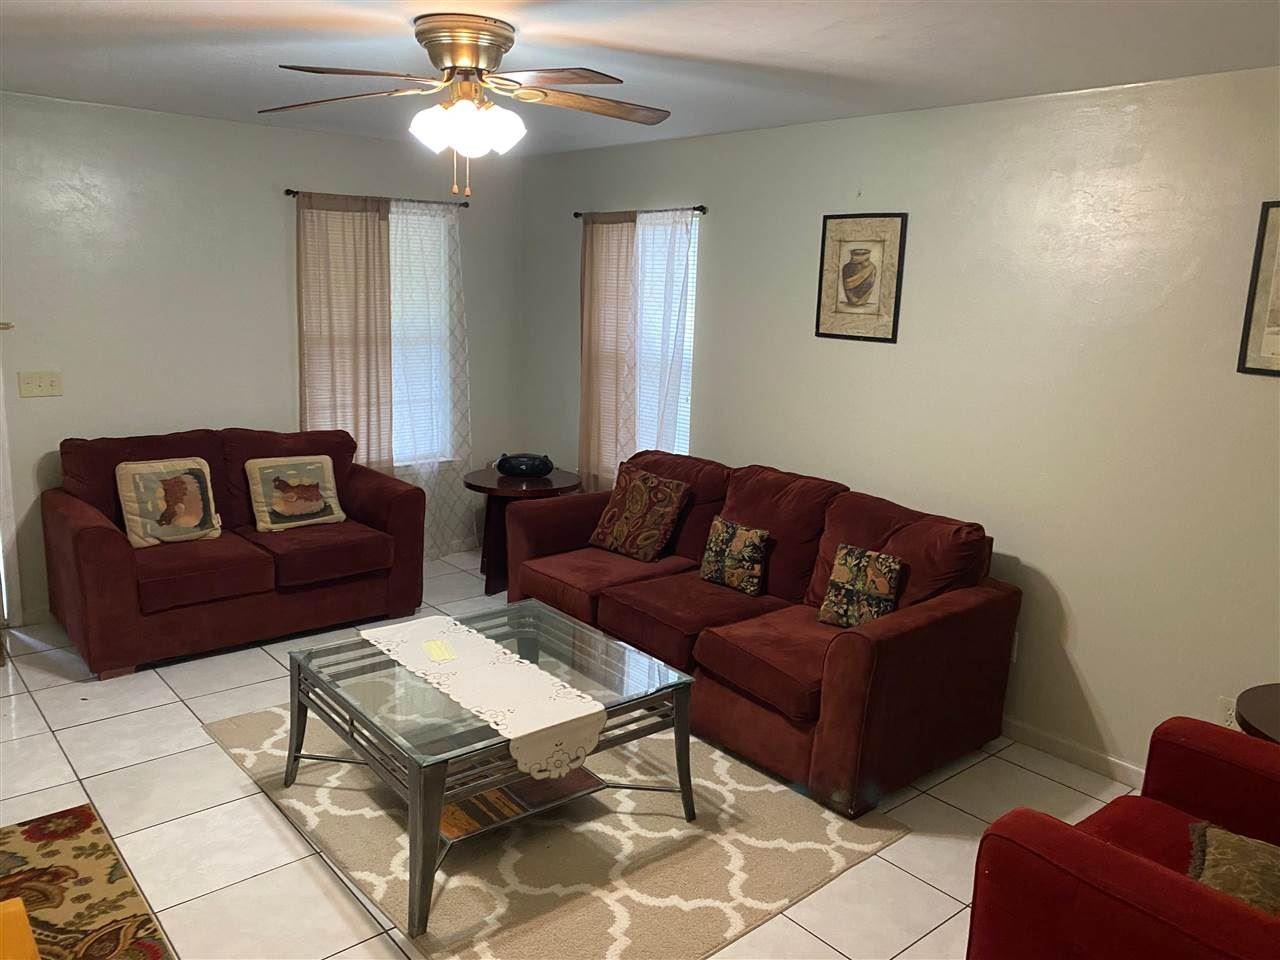 Photo of 214 Loraine Court, TALLAHASSEE, FL 32305 (MLS # 335105)